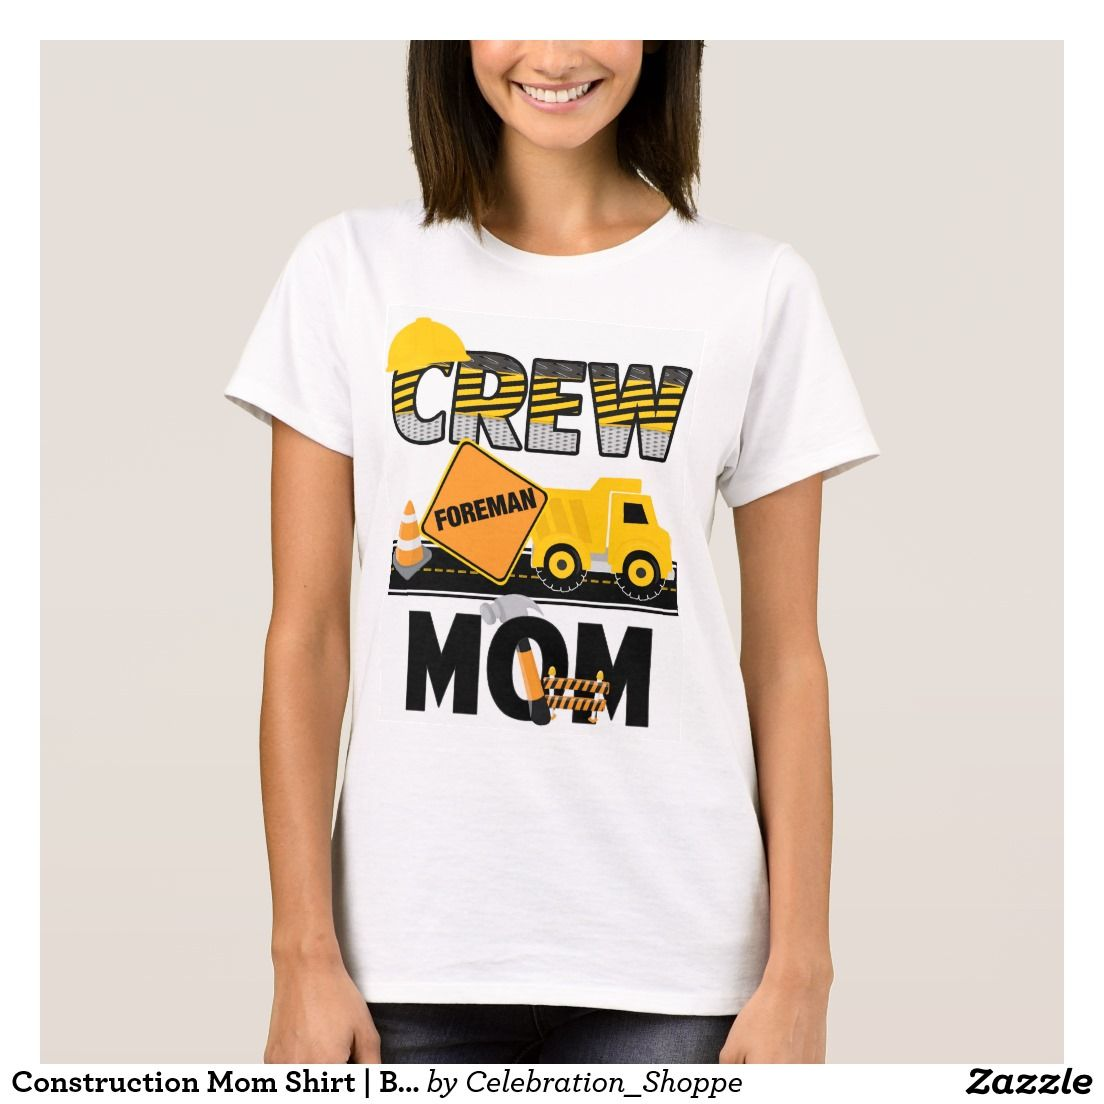 Construction Mom Shirt